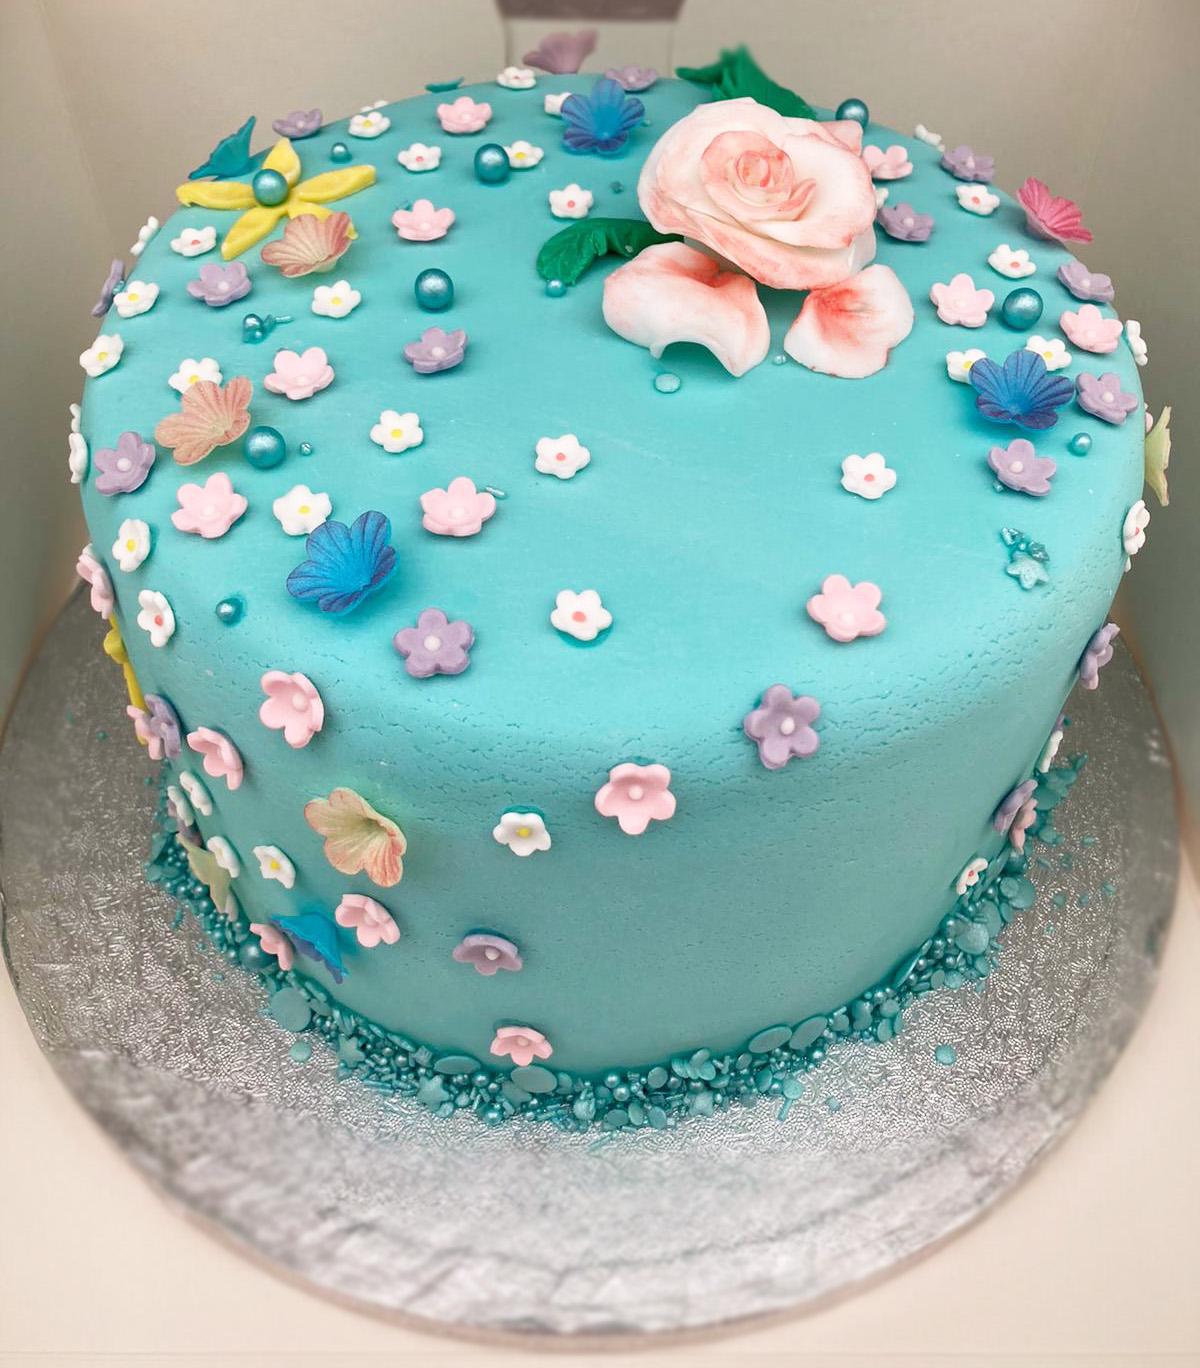 Meyer House cake